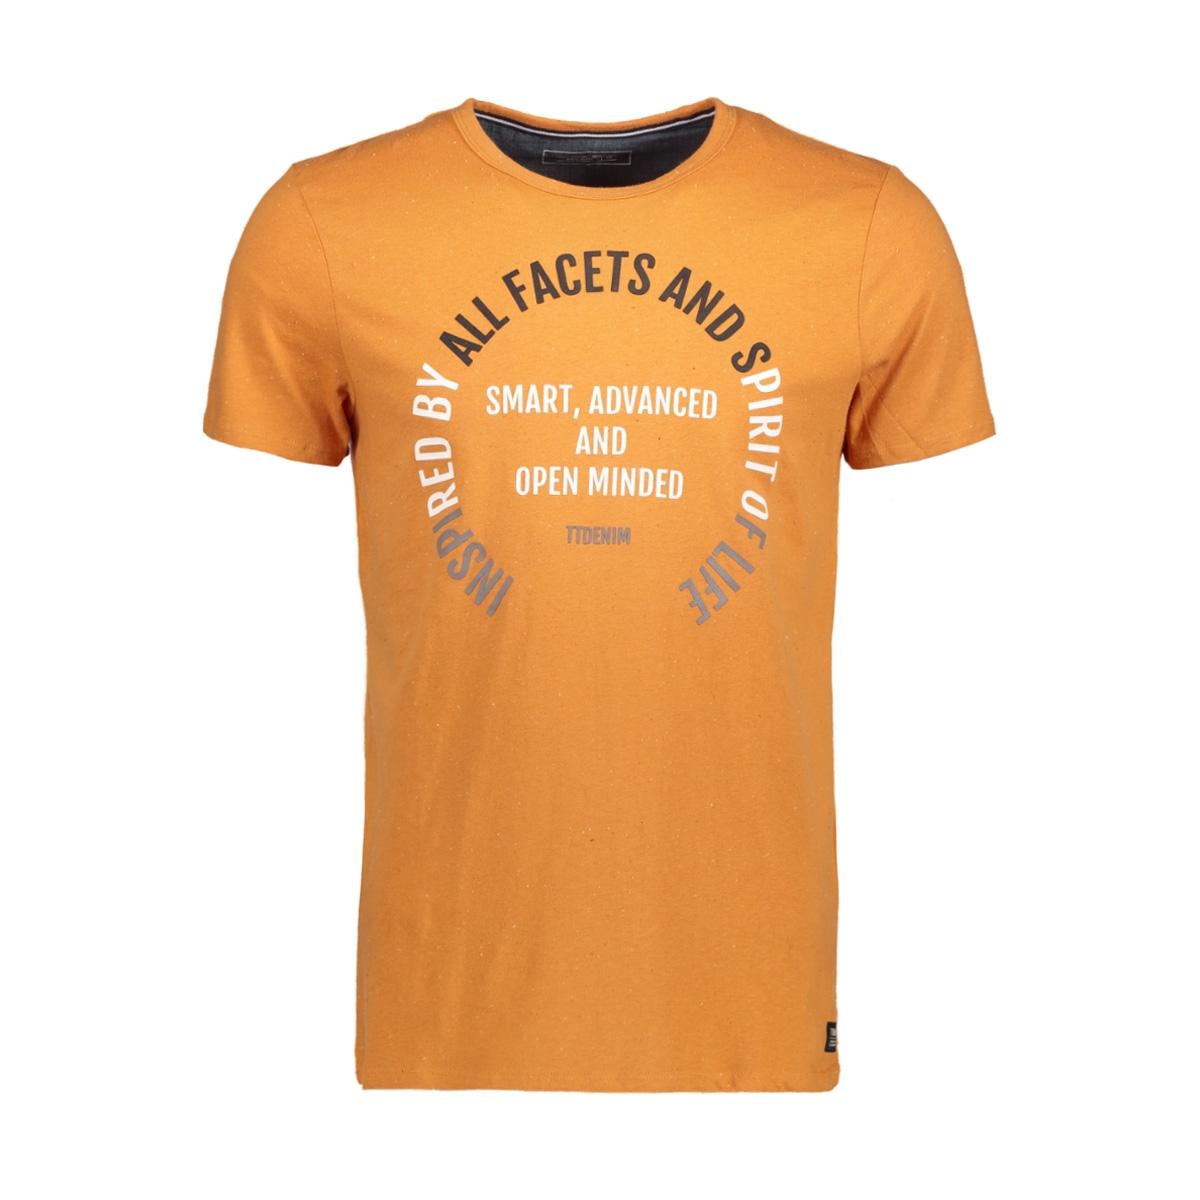 1055135.62.12 tom tailor t-shirt 3568